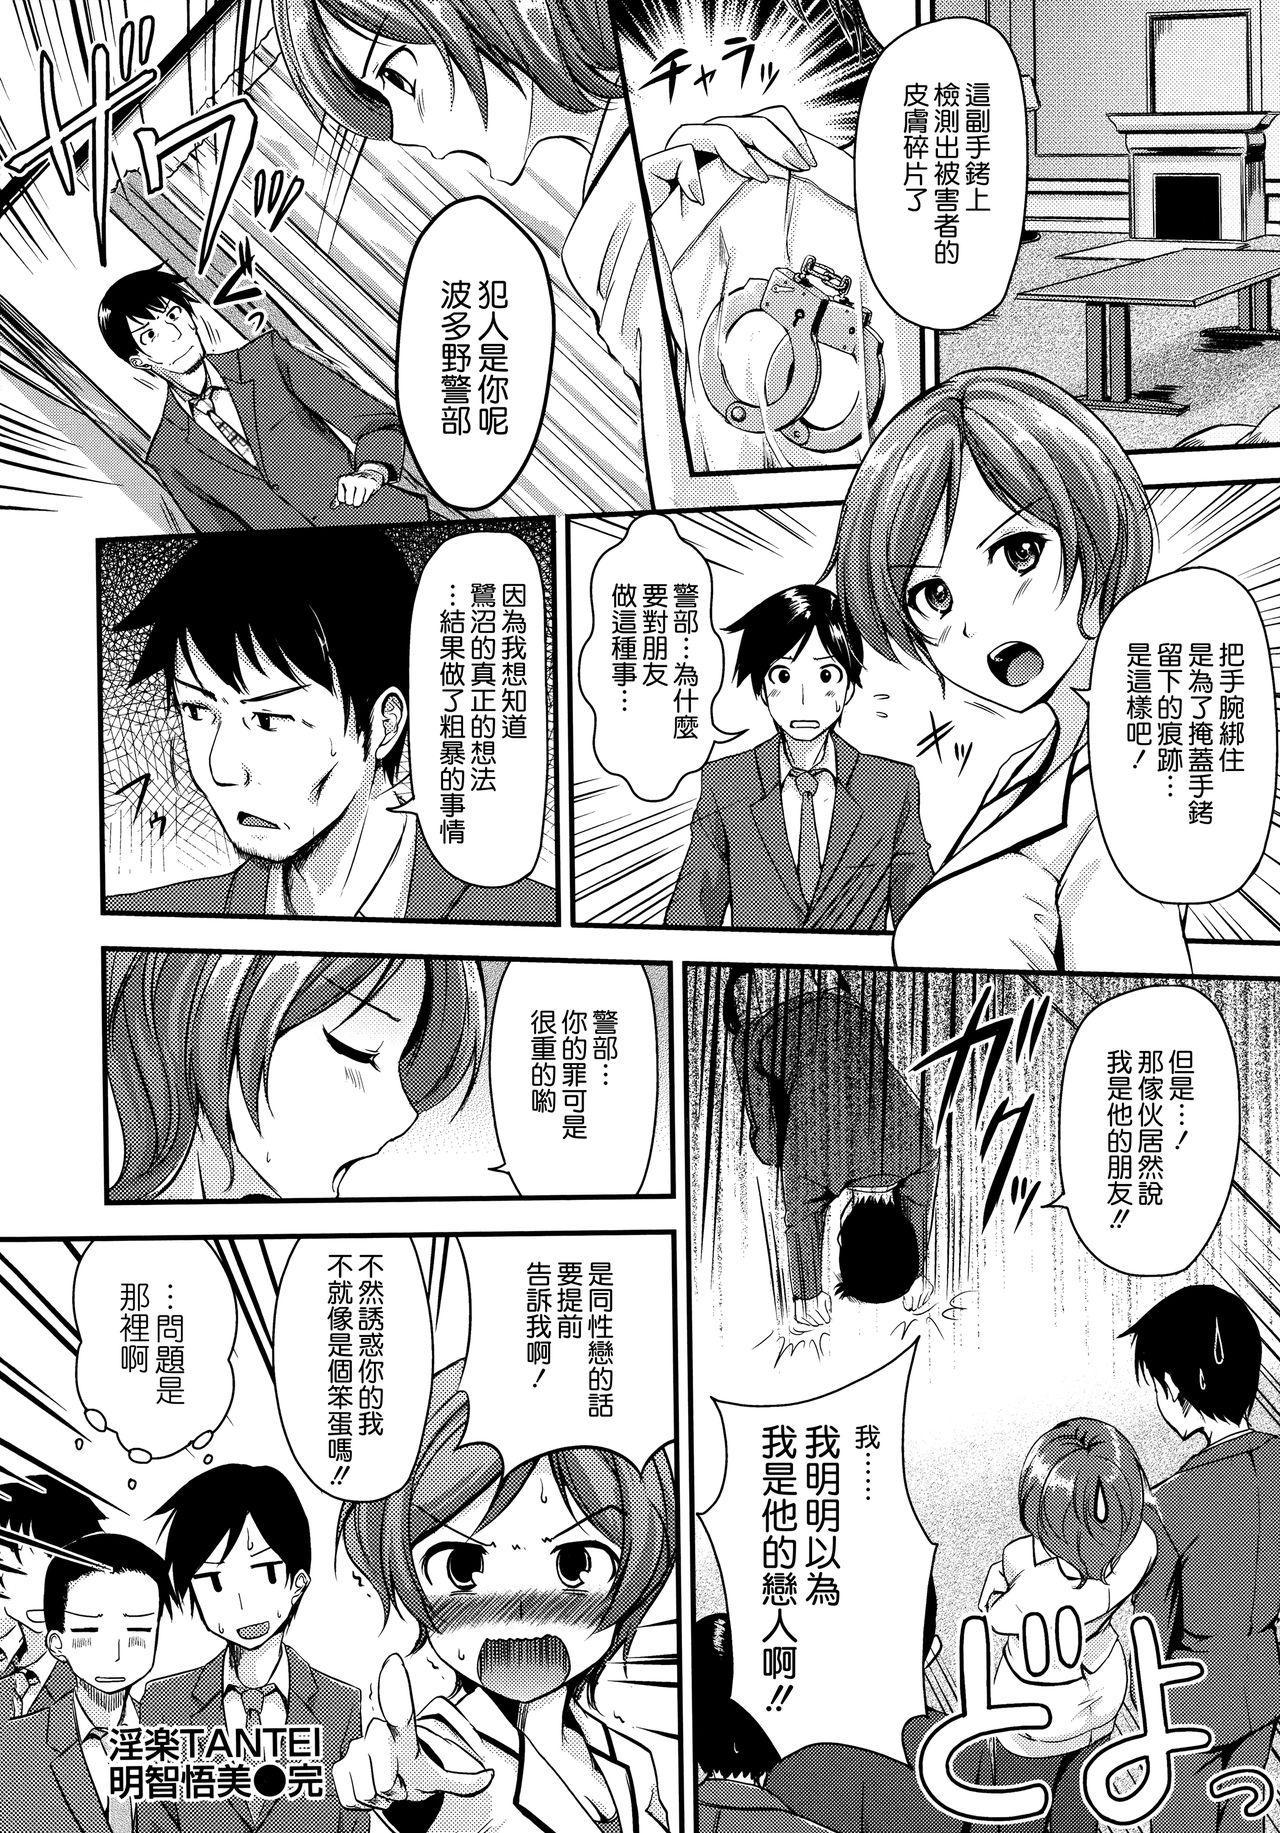 Kimagure Hanabira + Toranoana Leaflet 120